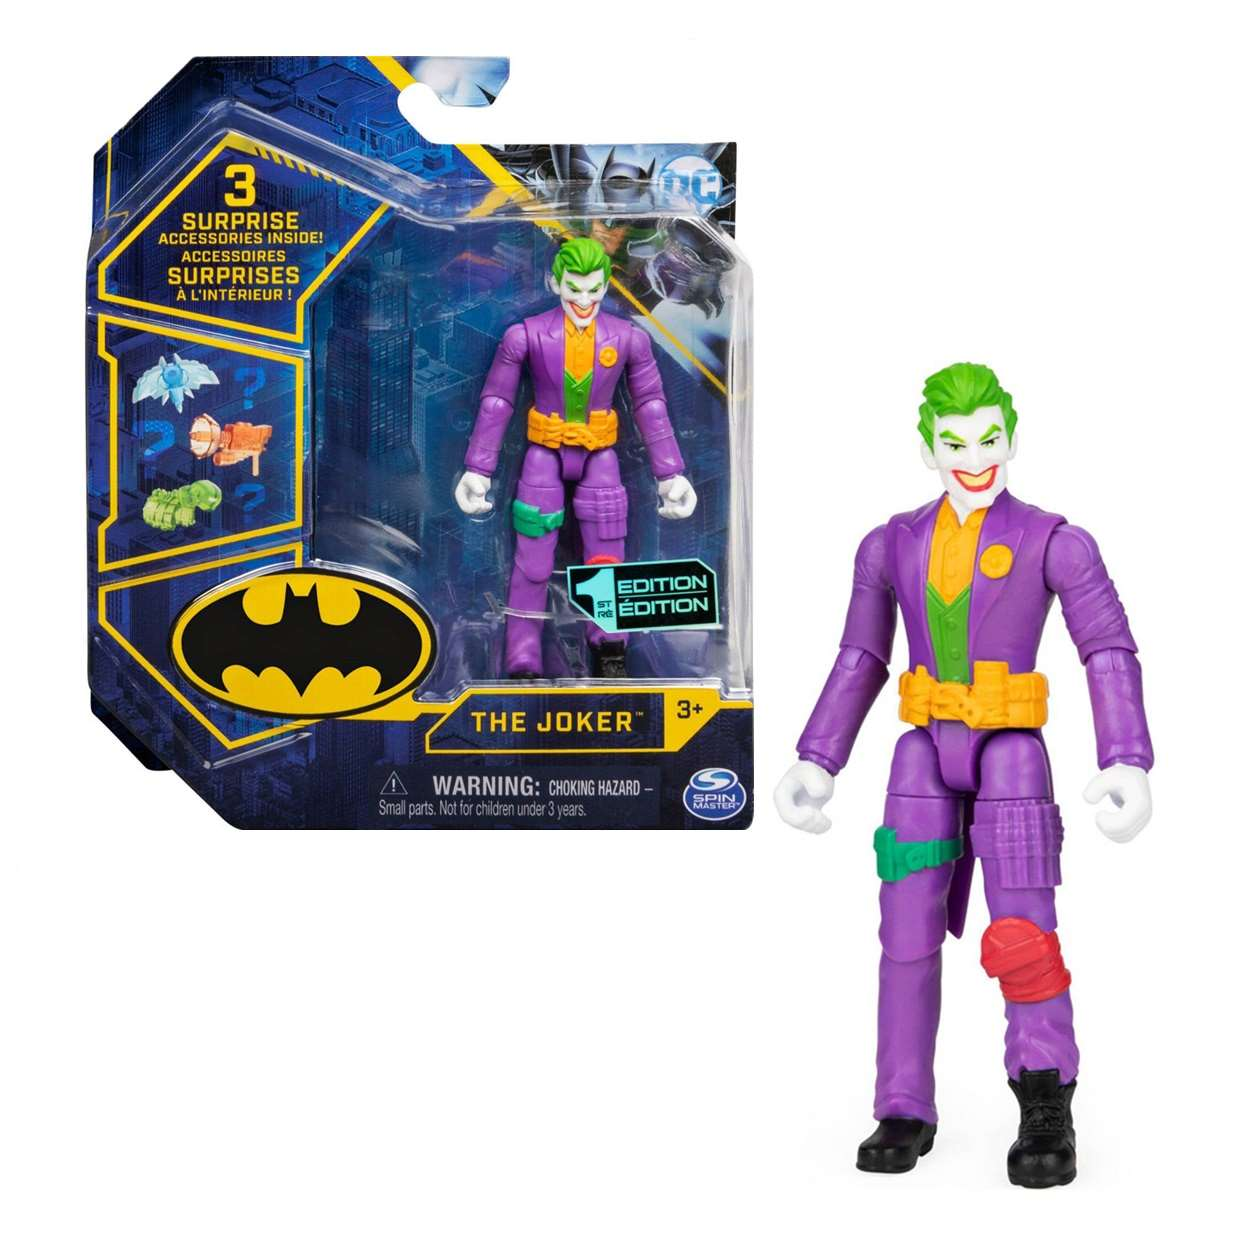 The Joker 1st Edition Figura Dc Comics Spin Master 3 Pulg